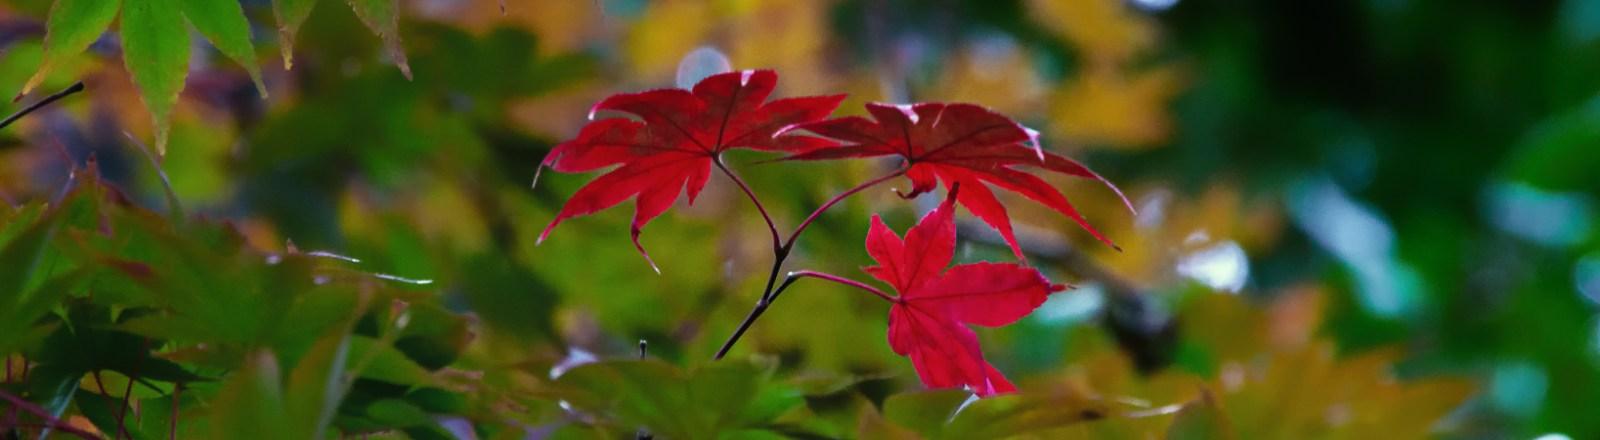 Autumn in Atlanta: Photo Mash-Up #1